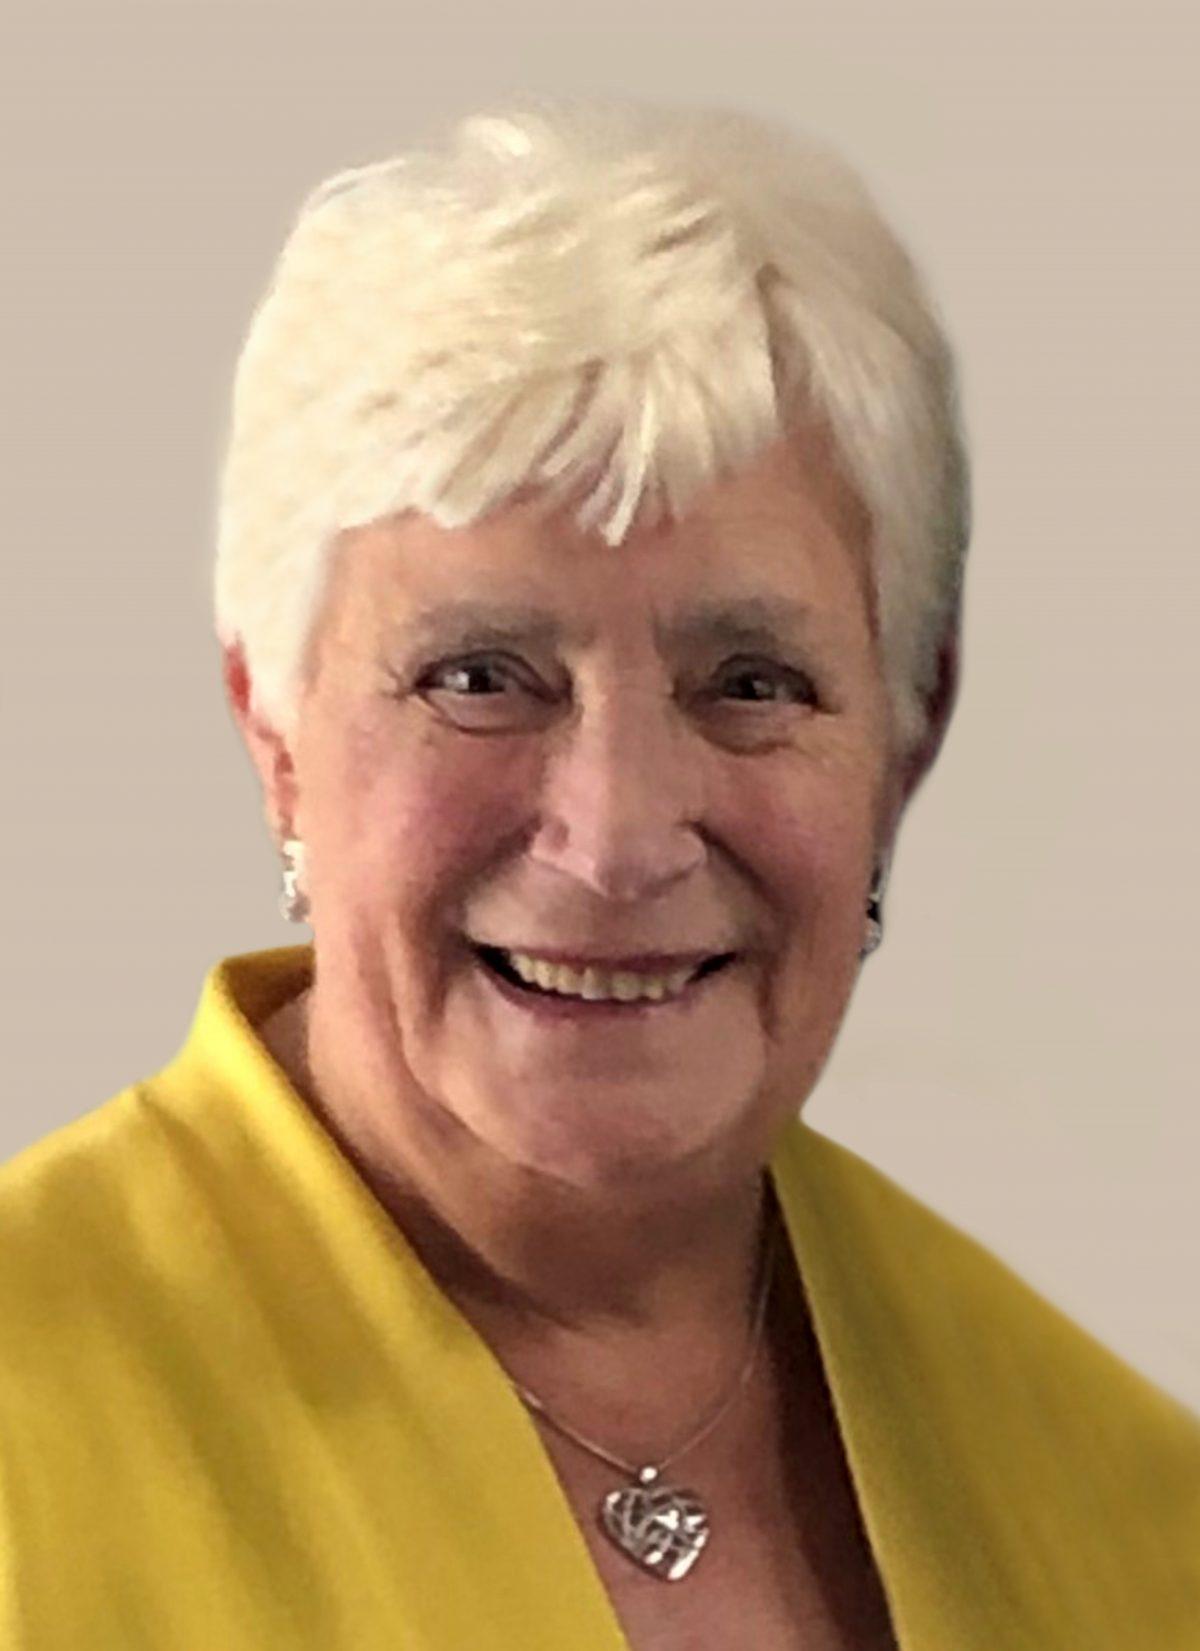 Maria Brepoels